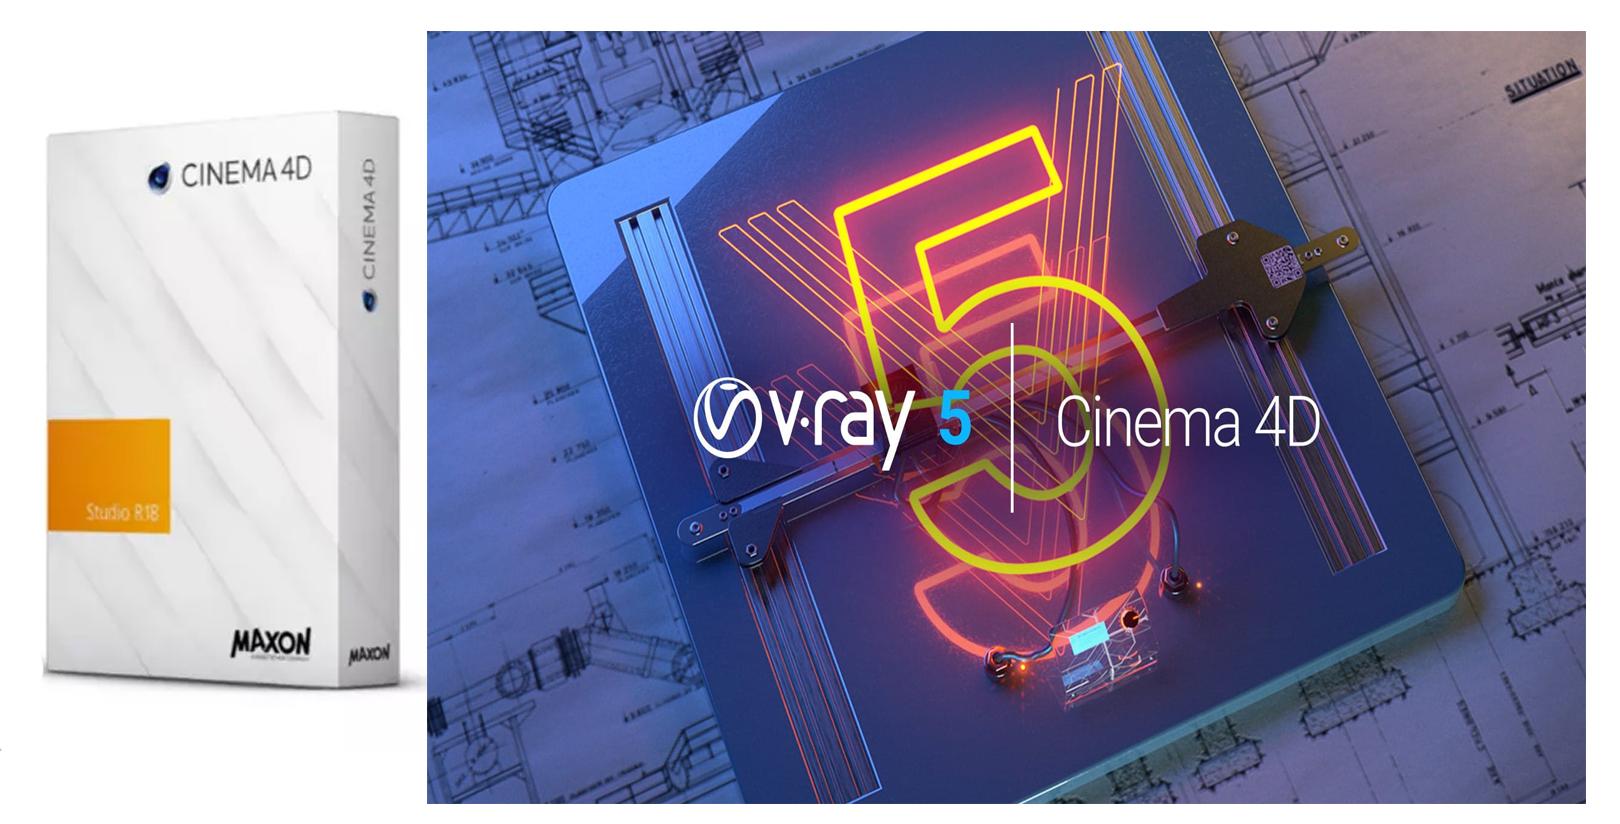 Cara Install Cinme 4D Plus VRay Full Version